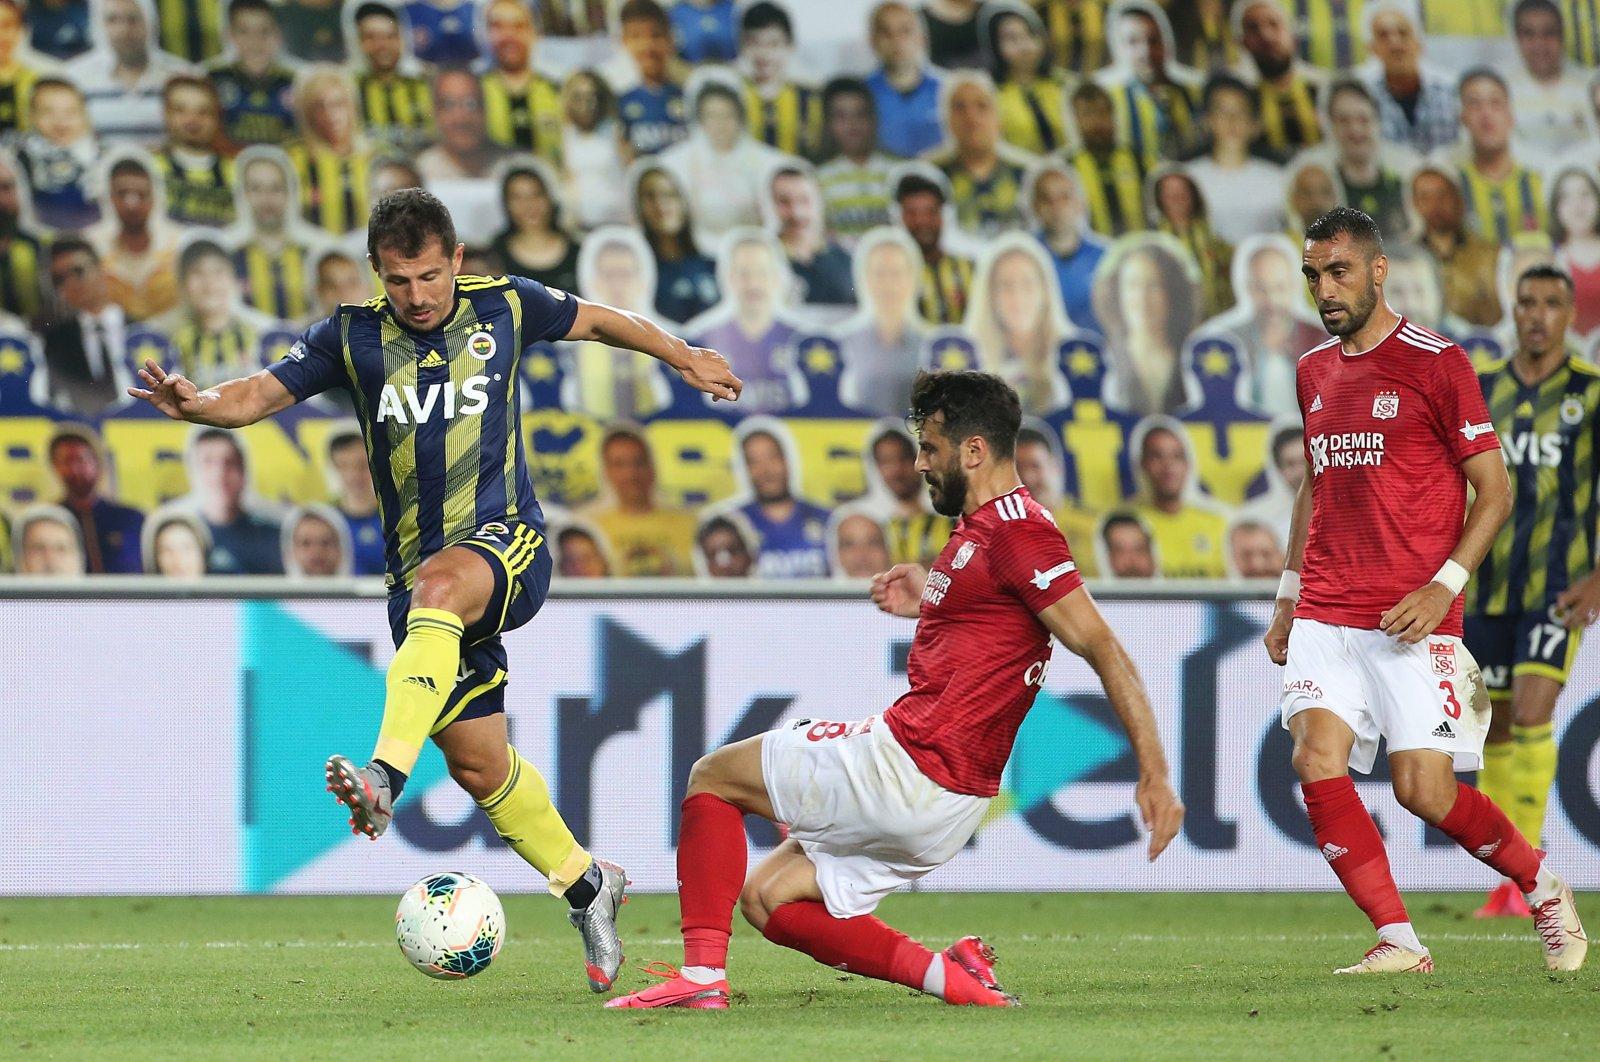 Fenerbahçe's Emre Belözoğlu in action against Sivasspor's Caner Osmanpaşa, in Istanbul, Turkey, July 12, 2020. (AA Photo)